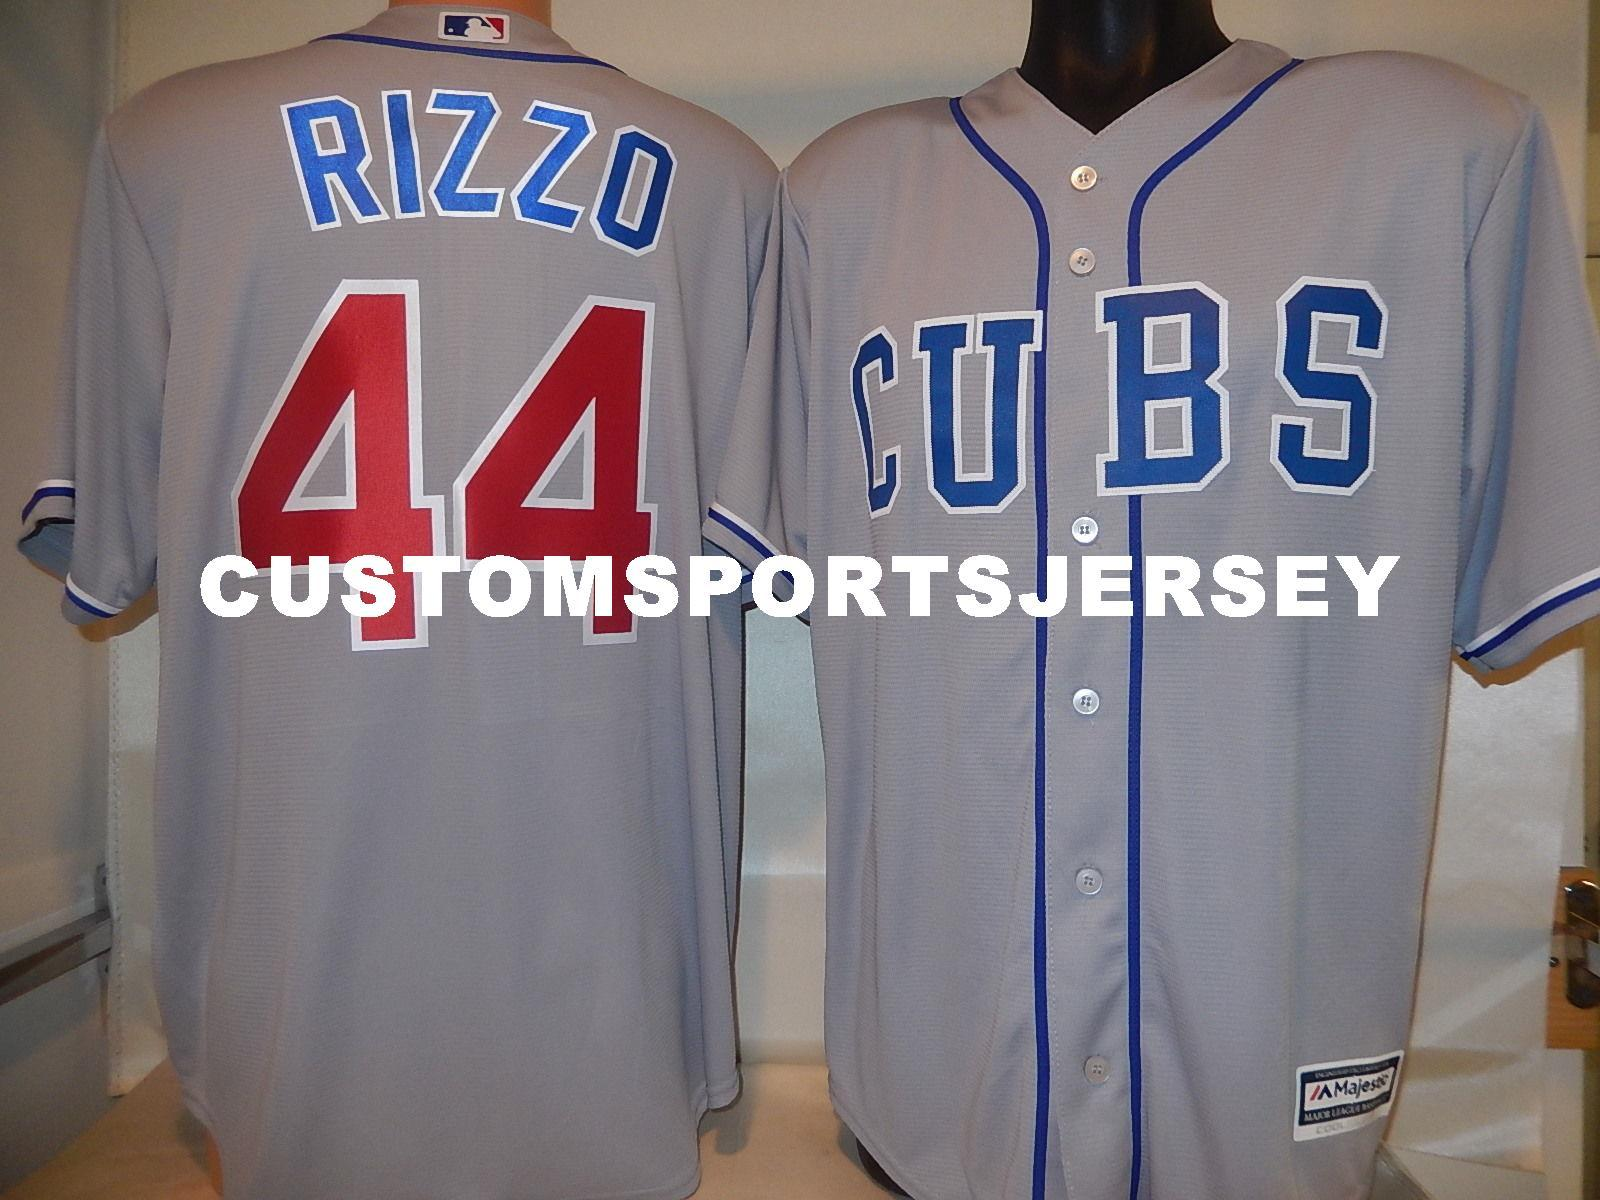 2019 Cheap Custom ANTHONY RIZZO Cool Base Baseball Jersey GRAY New Stitched  Customize Any Name Number MEN WOMEN BASEBALL JERSEY XS 5XL From ... 9bd327fbd